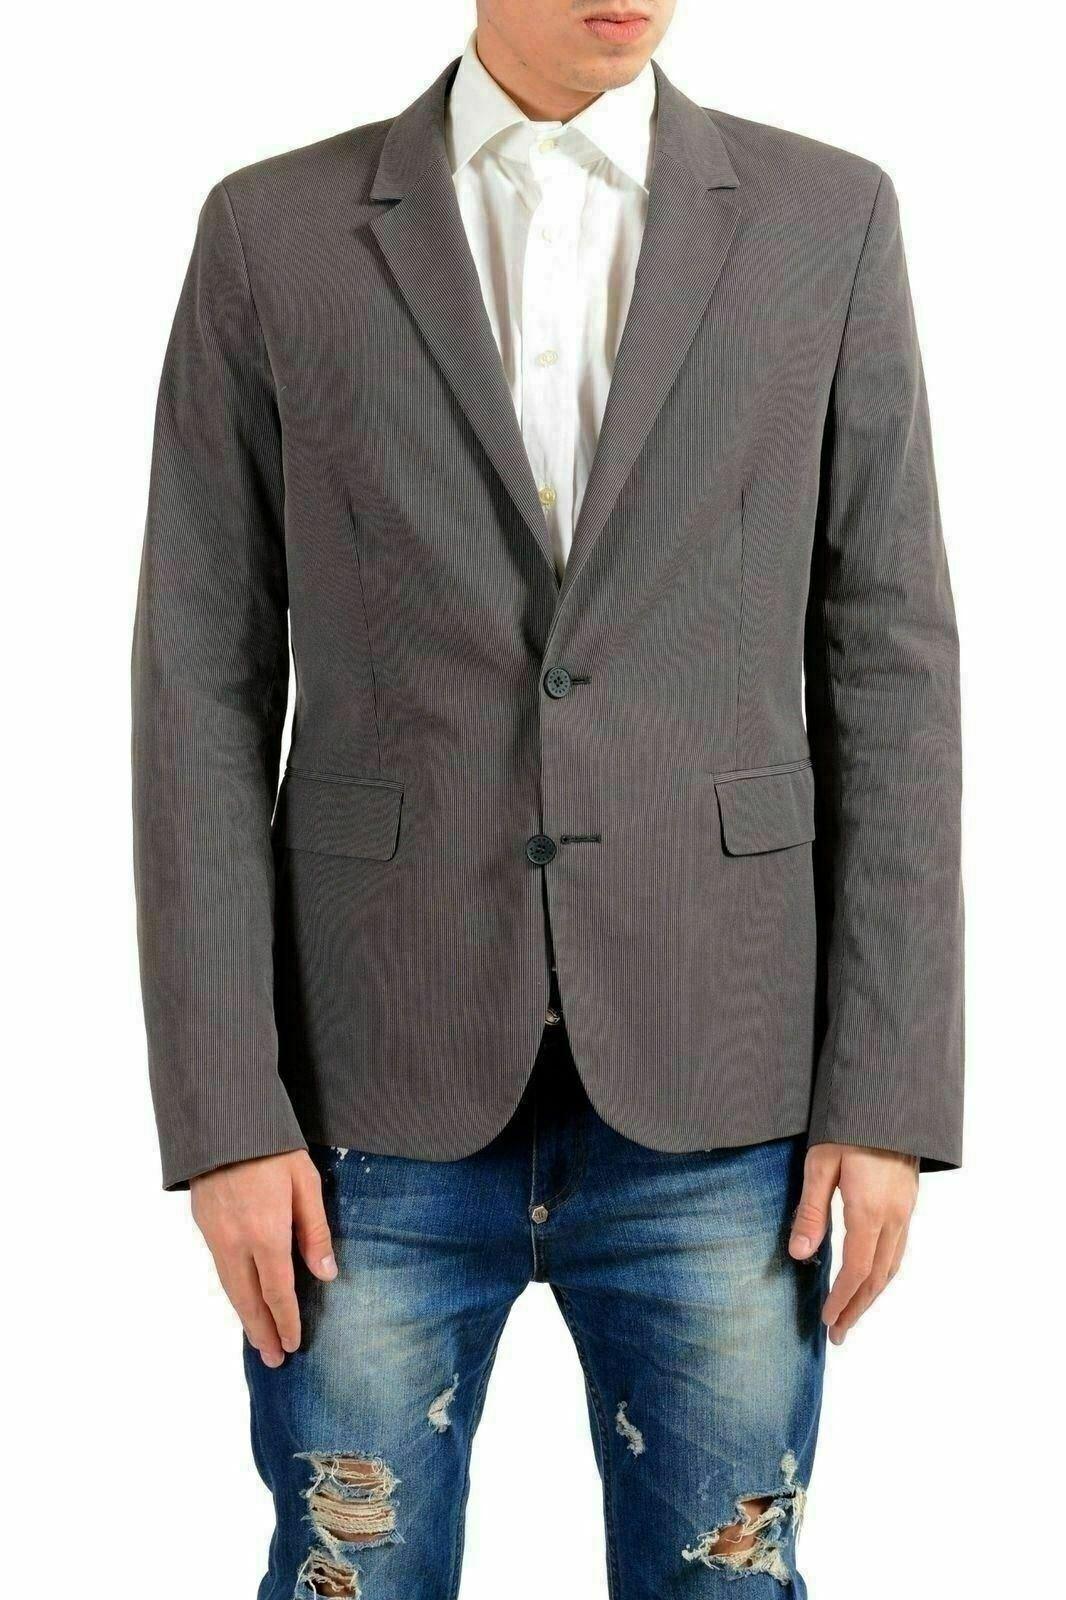 Versace Jeans Herren Grau Zwei Knöpfe Blazer Sport Mantel US 40 It 50